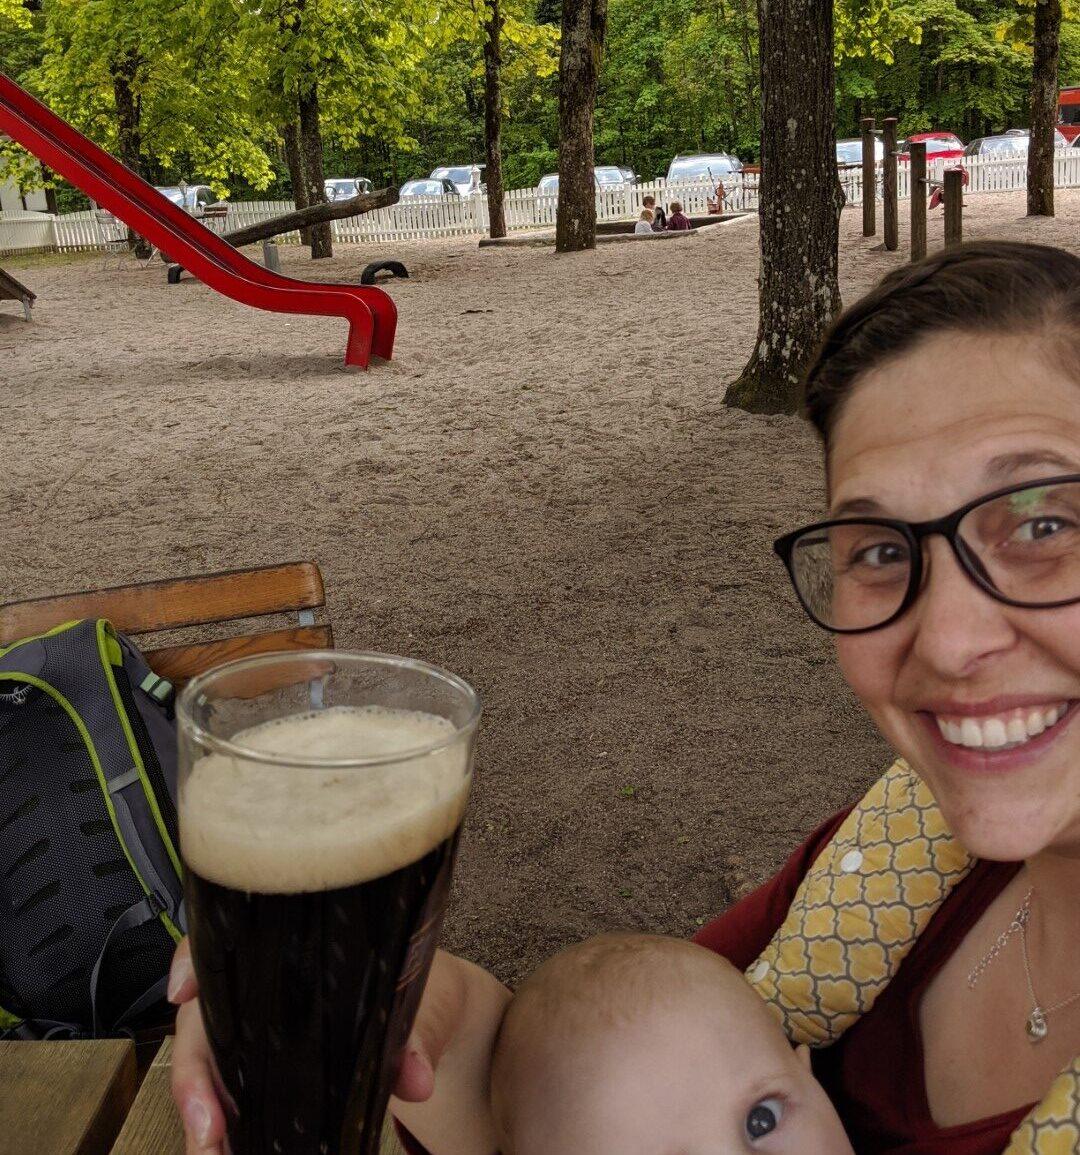 Germany beer garden with kids